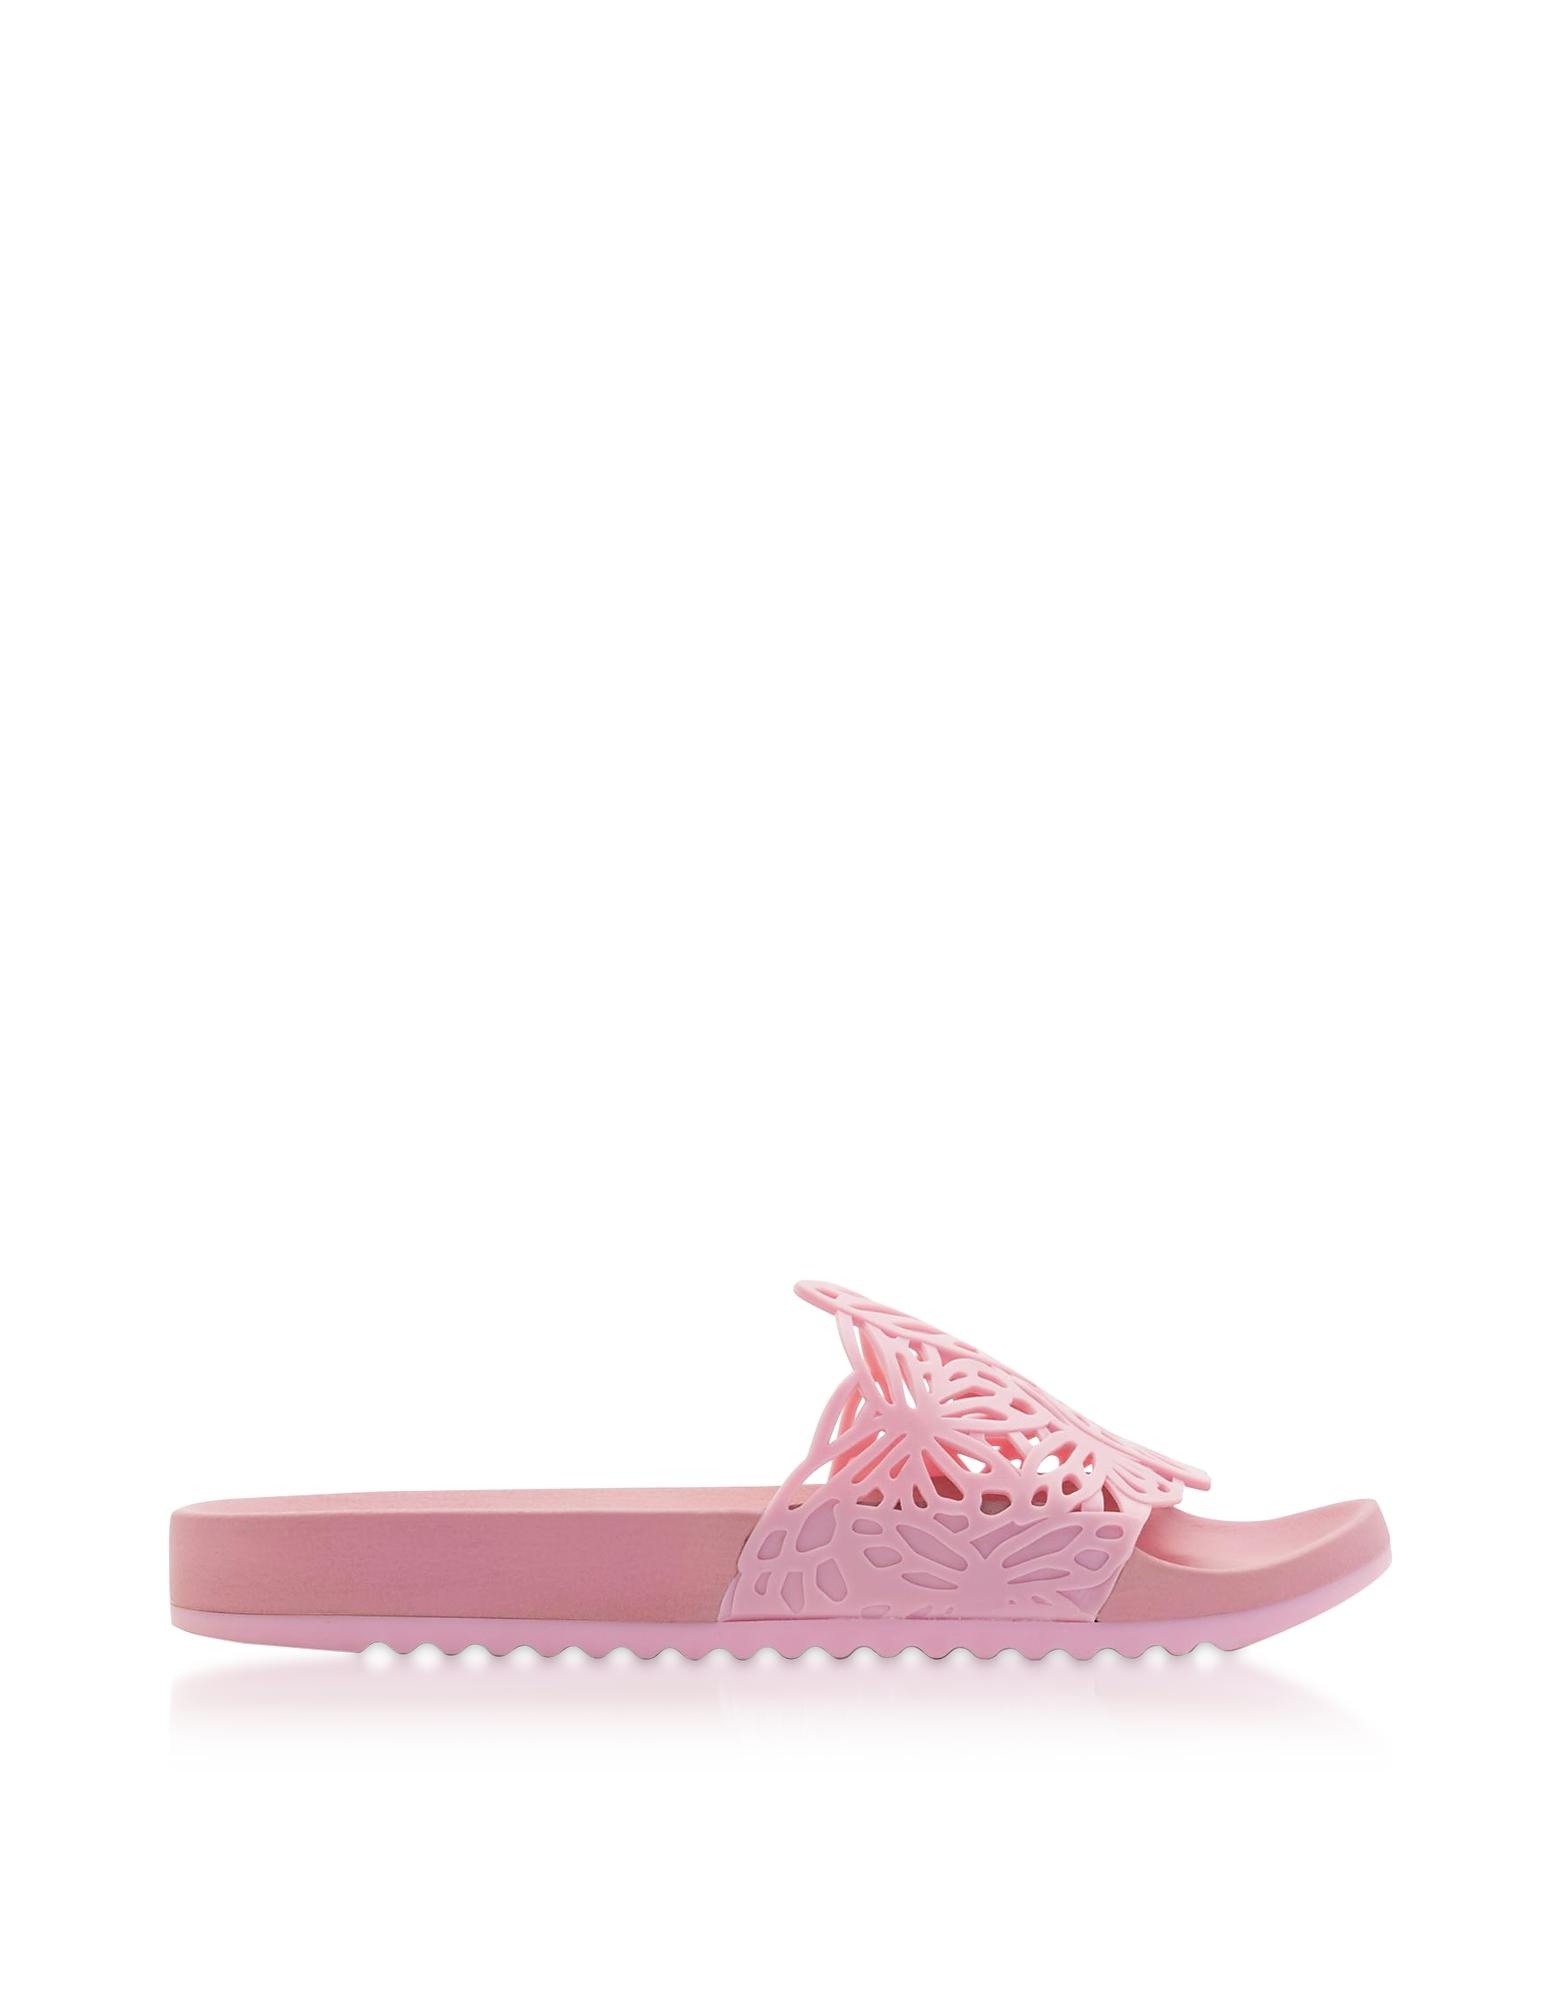 Lia - Светло-розовые Шлепанцы из ПВХ с Бабочками